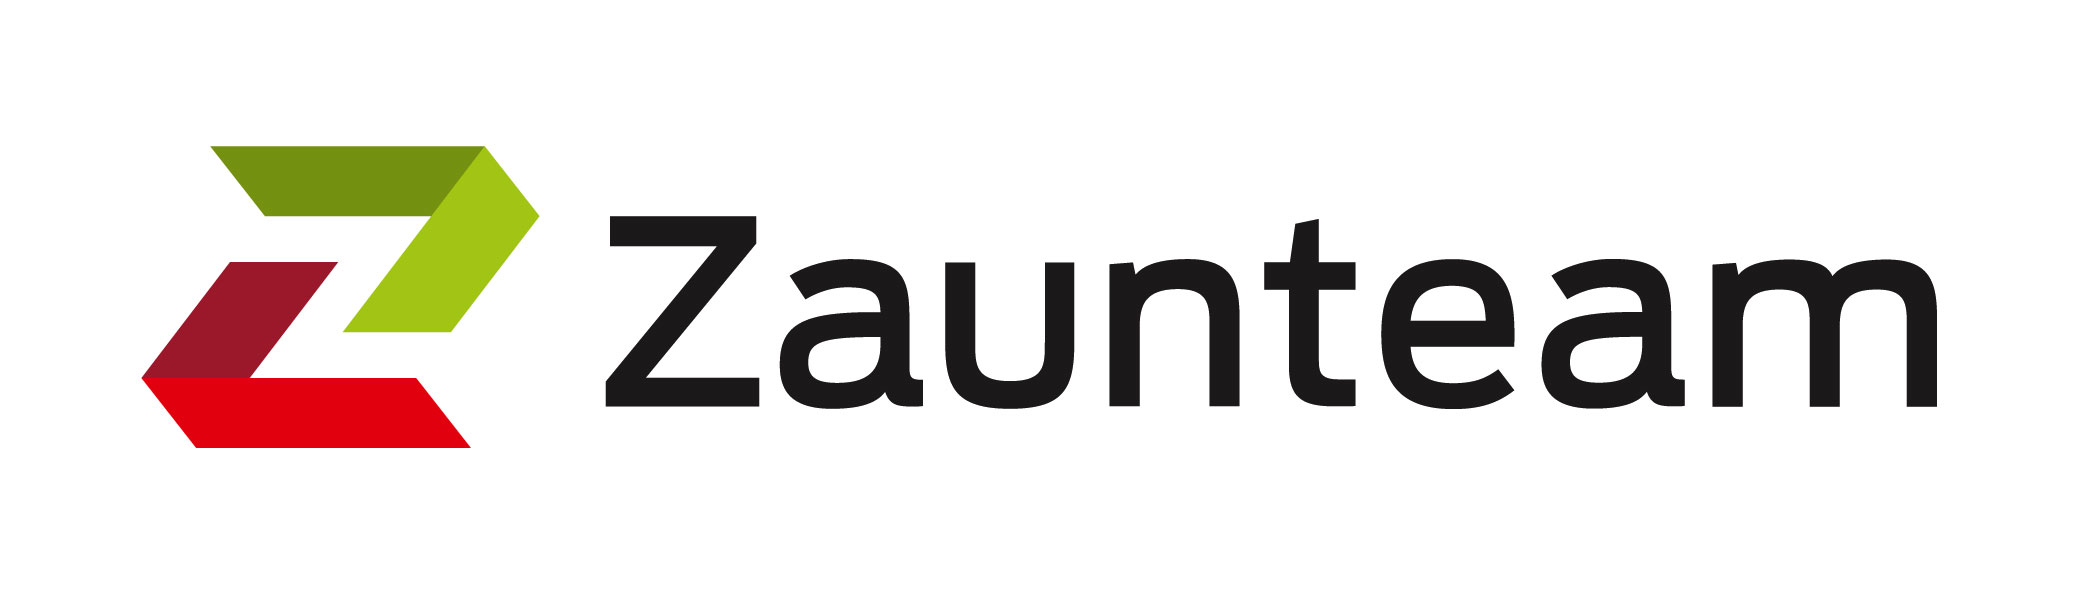 Zaunteam Zaunsysteme GmbH